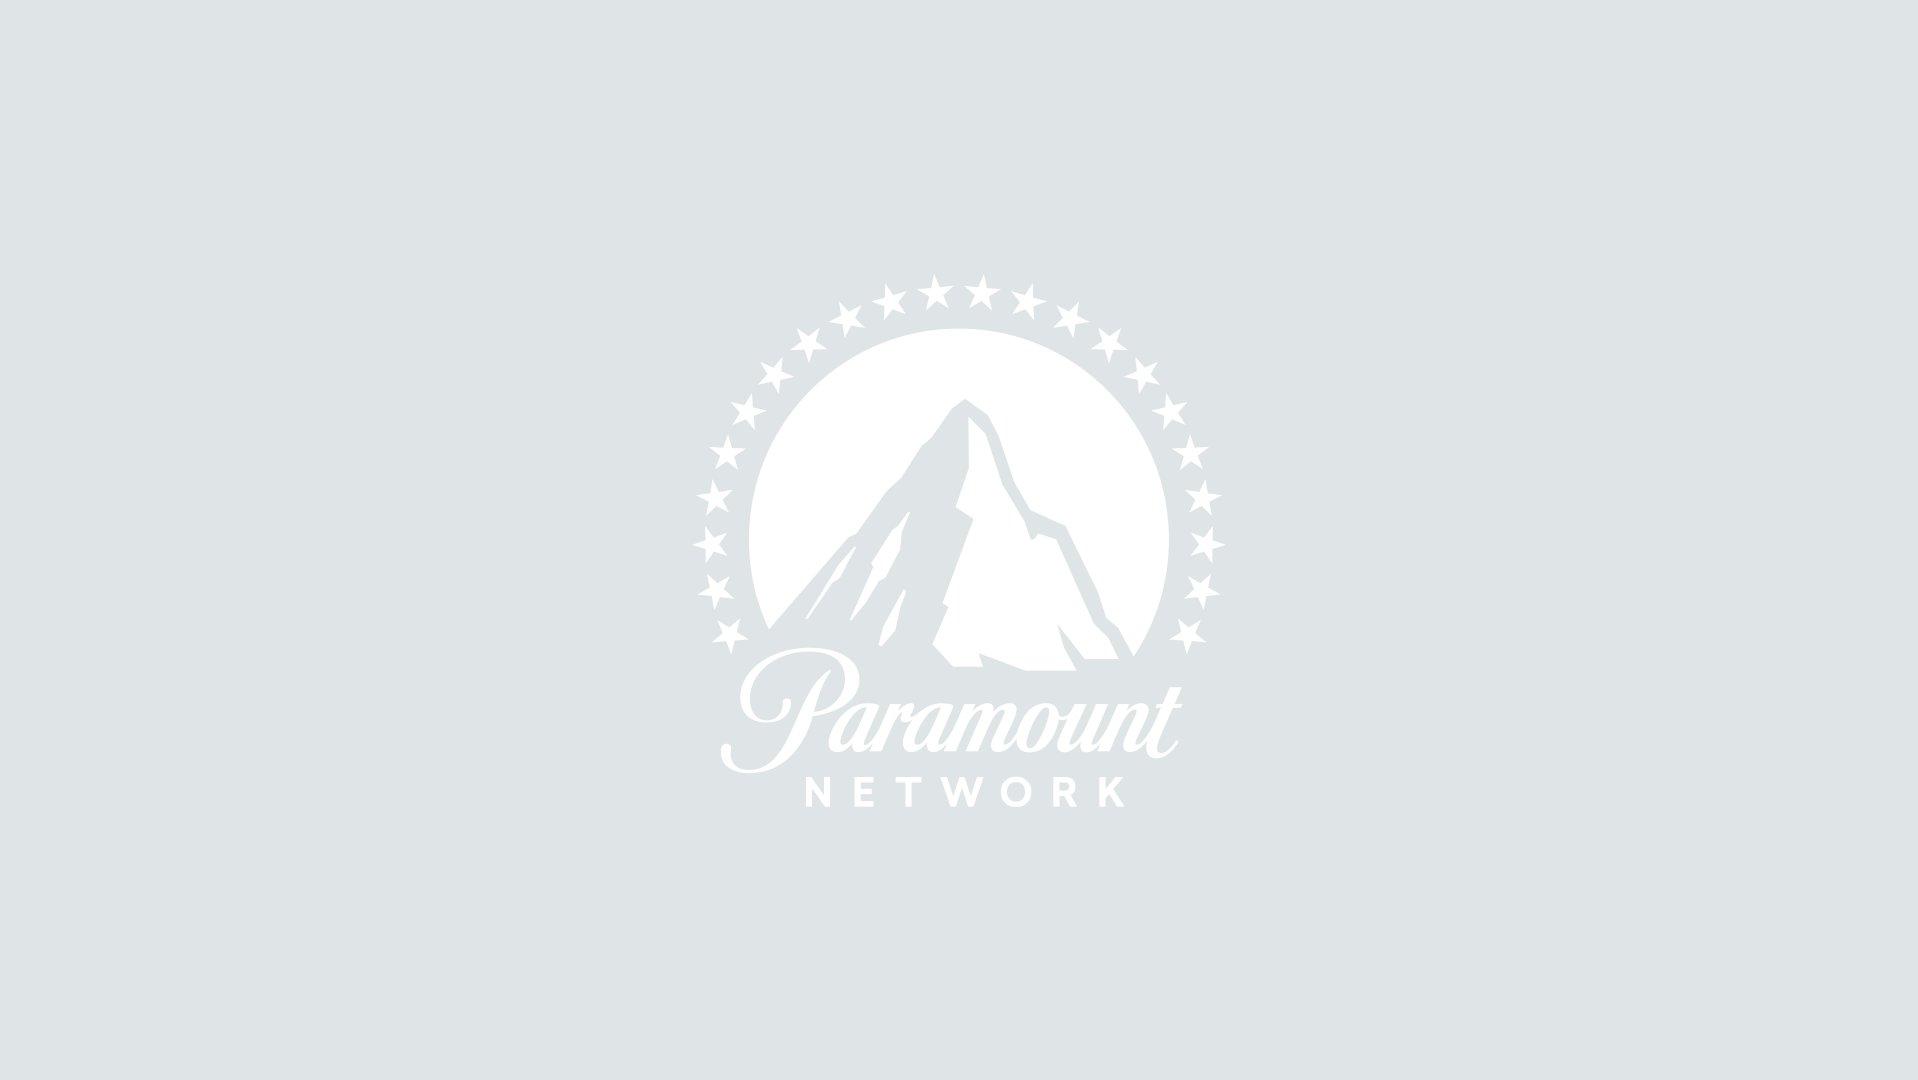 5. George Clooney (89,91% di perfezione), foto: Getty Images